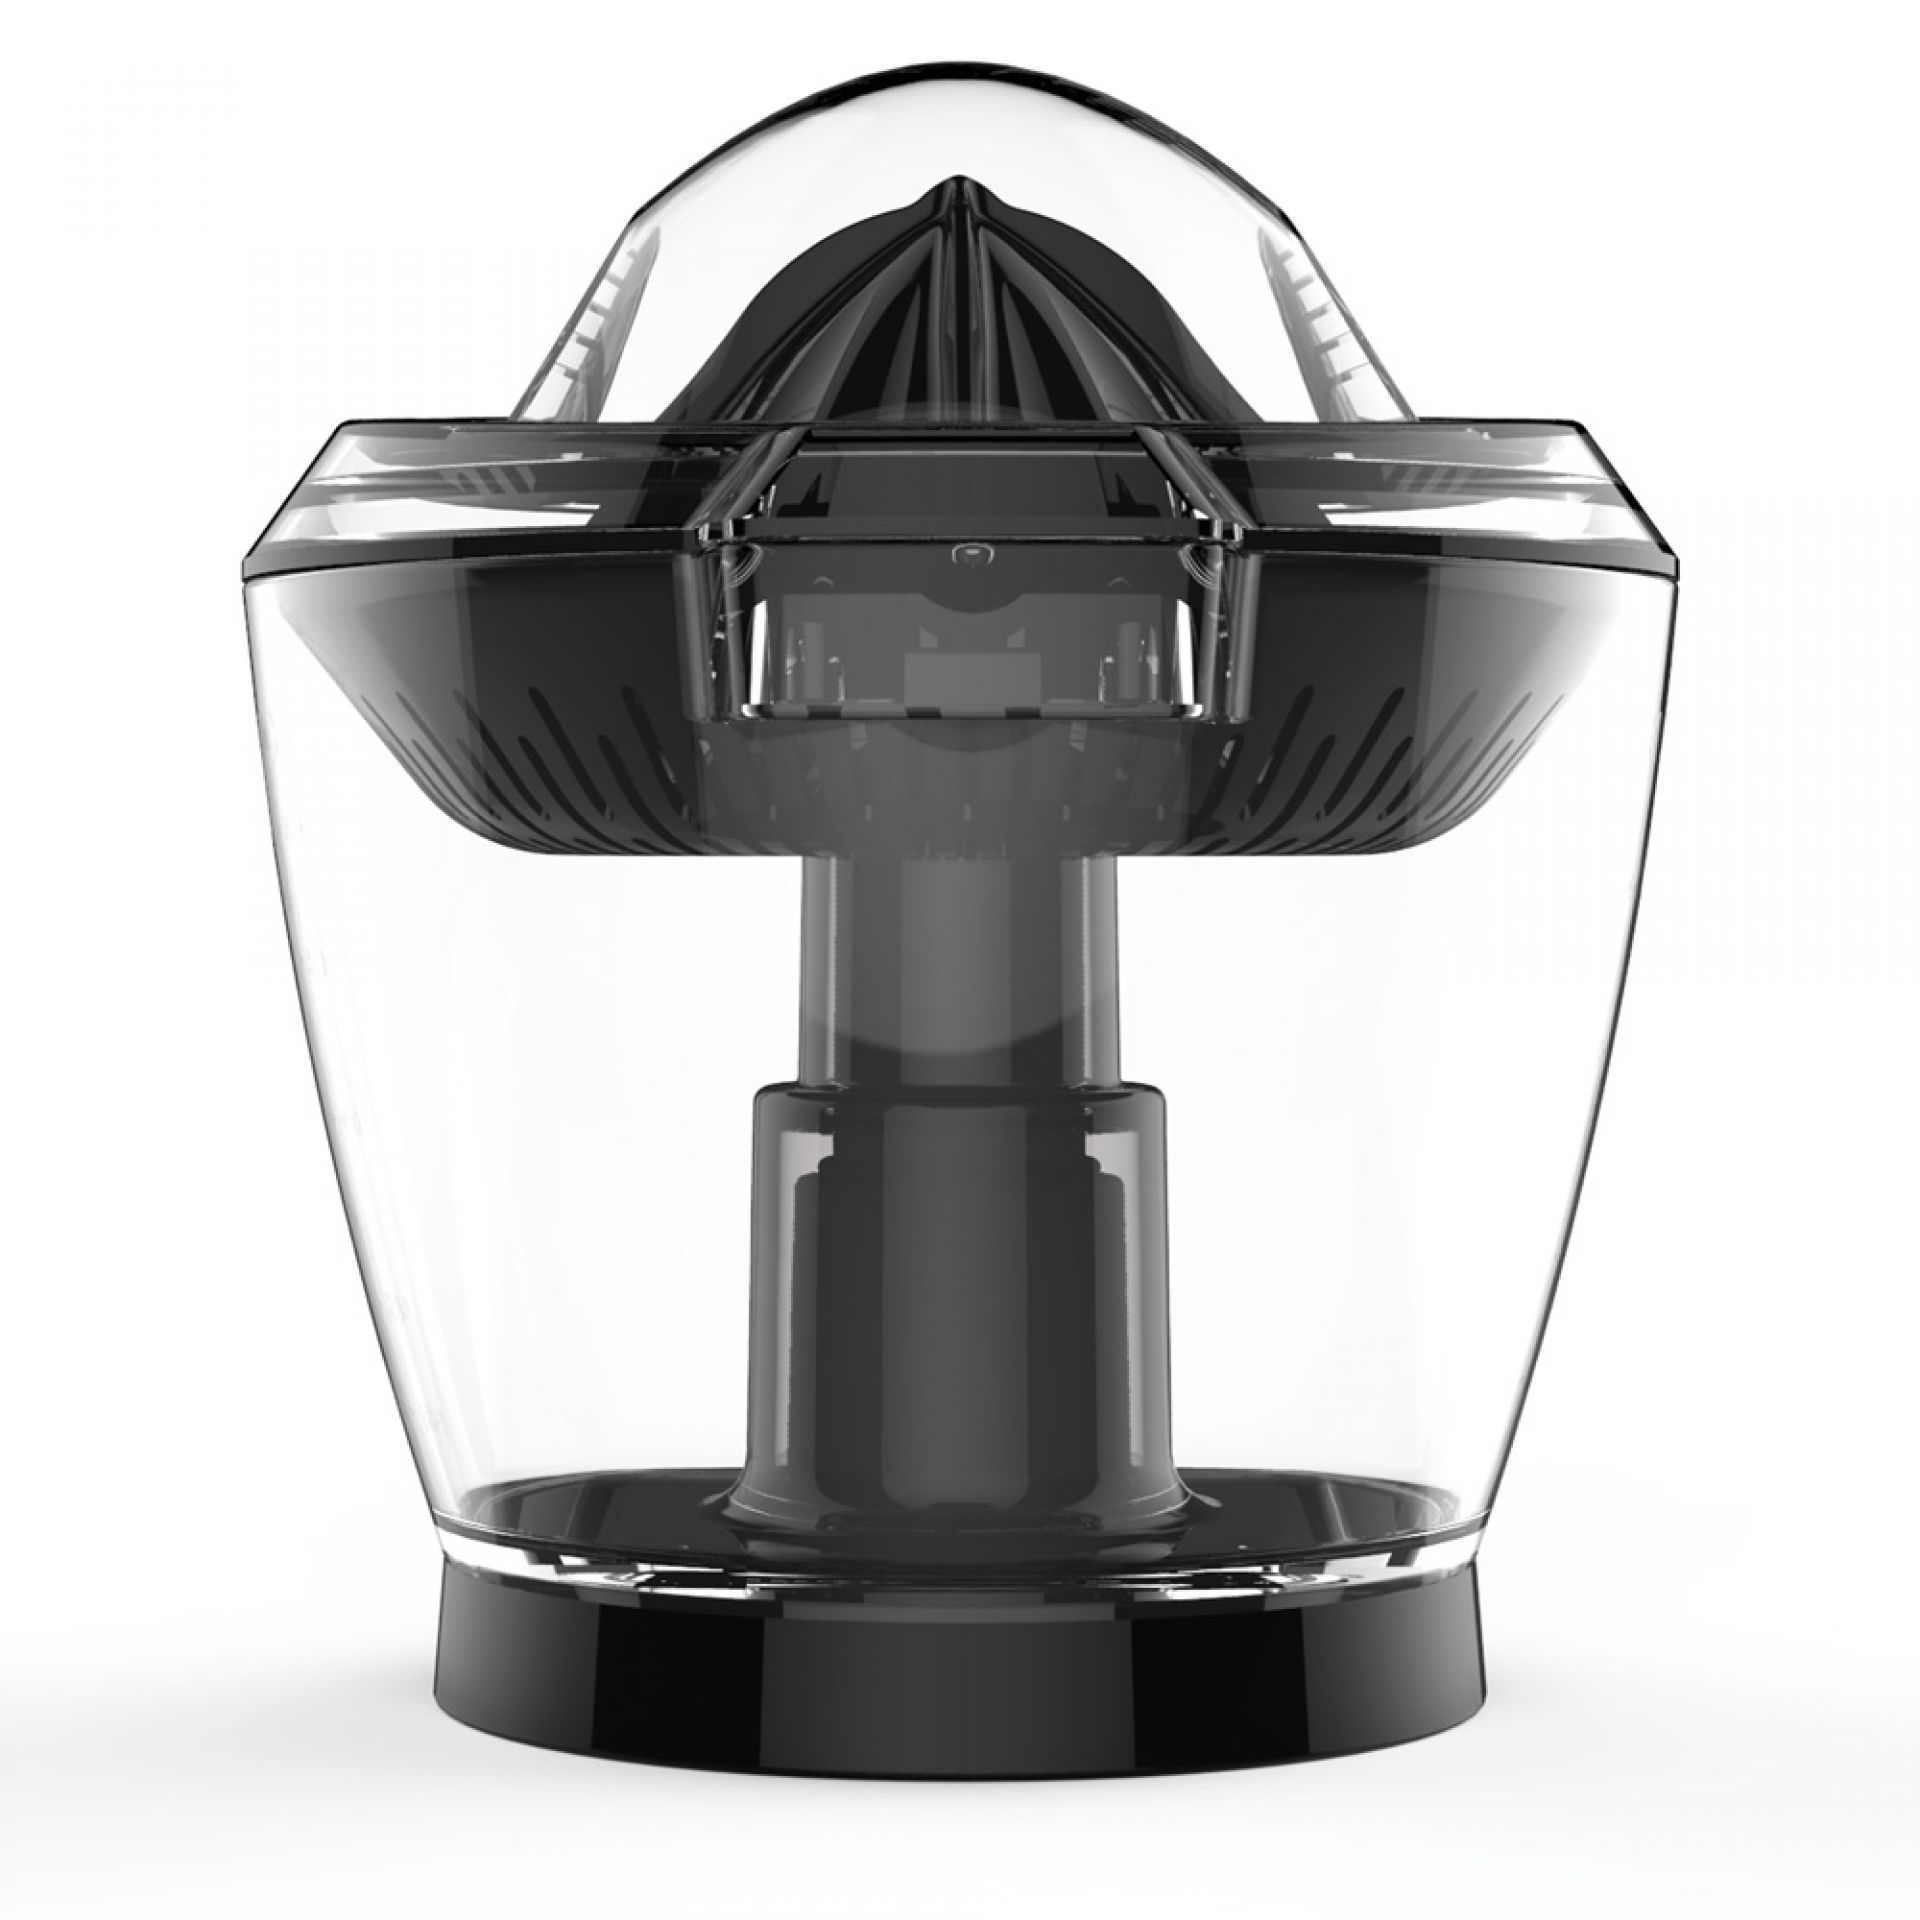 Zitruspressen Aufsatz fuer Kuvings Whole Slow Juicer C9500 C9820 B6000 B8200